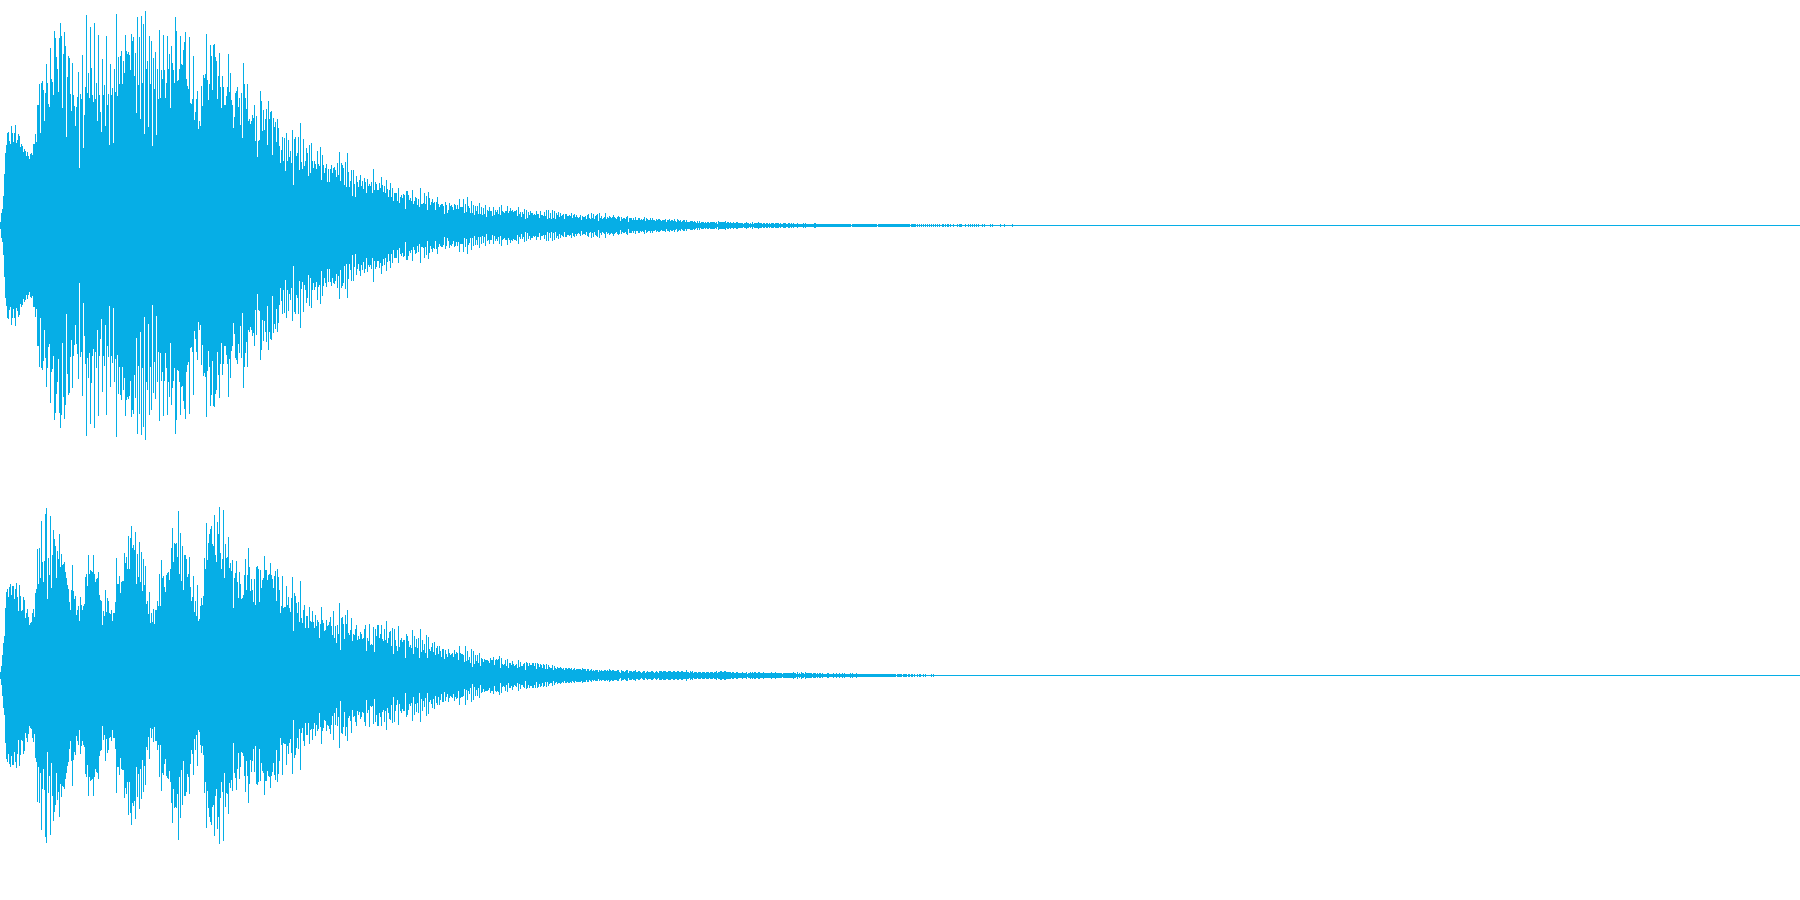 理科 化学 実験 変化 不思議 10の再生済みの波形